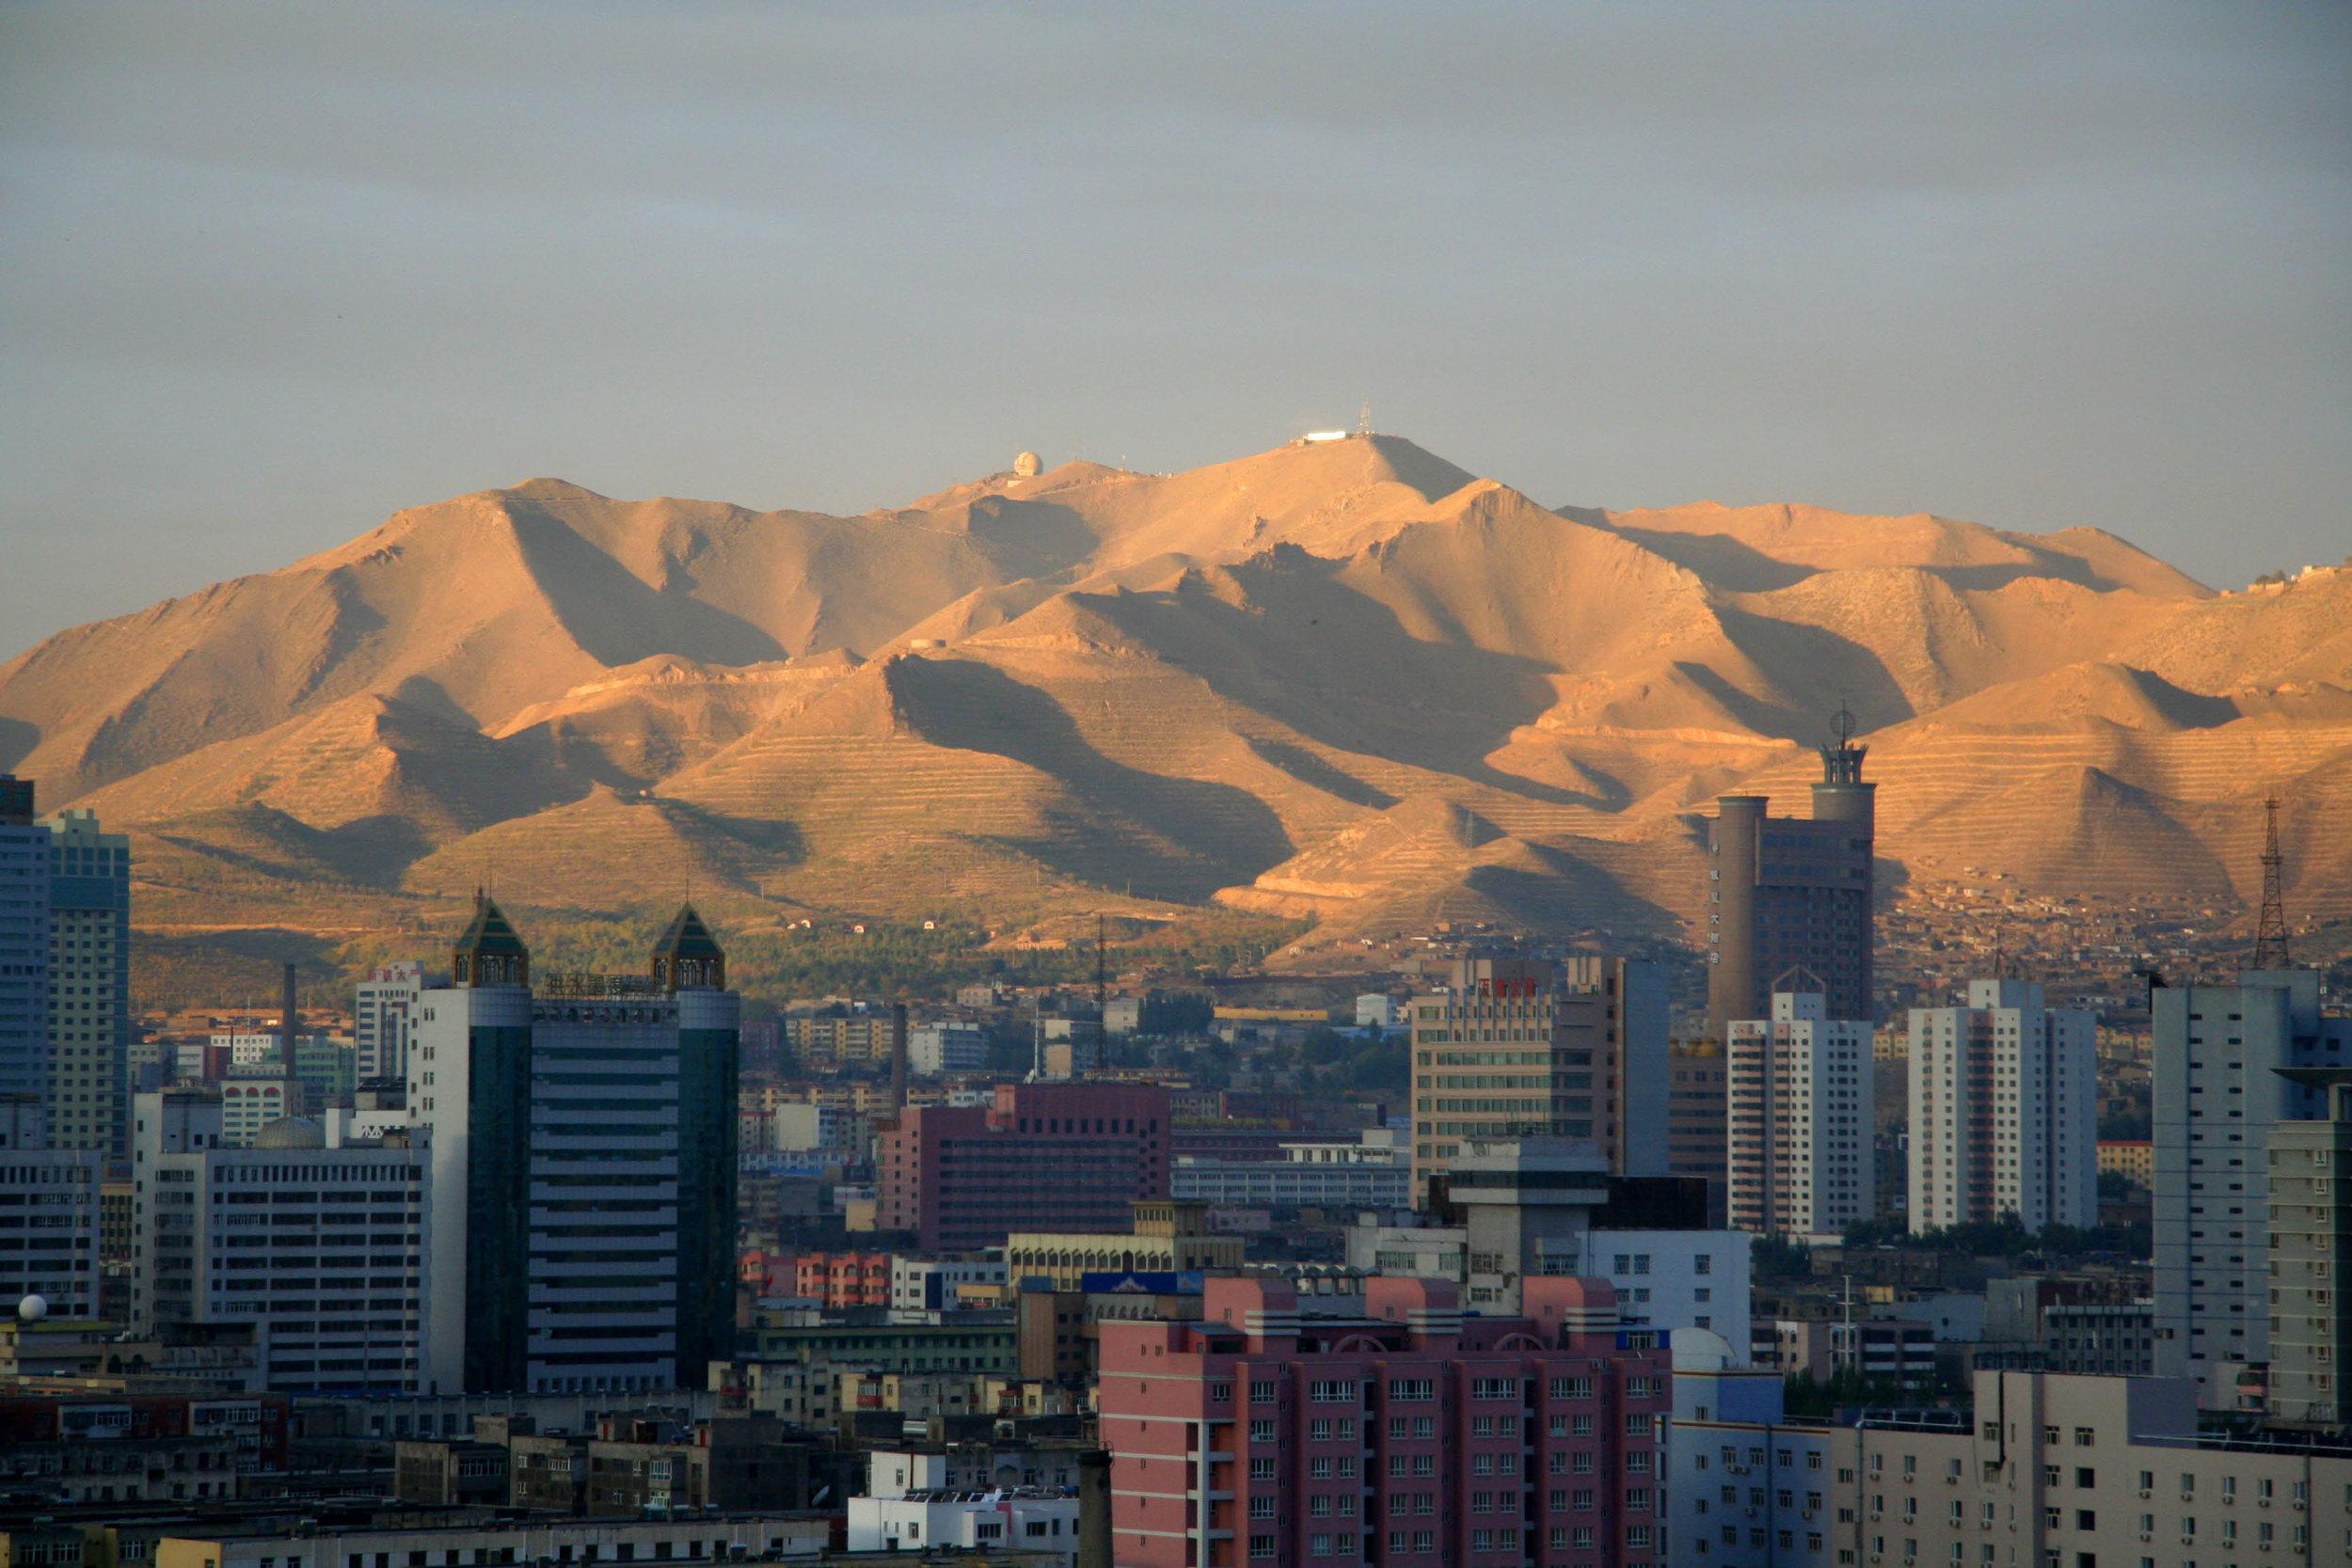 The city of Urumqi, capital of the Xinjiang Uyghur Autonomous Region. Photo:  Richard Towell .